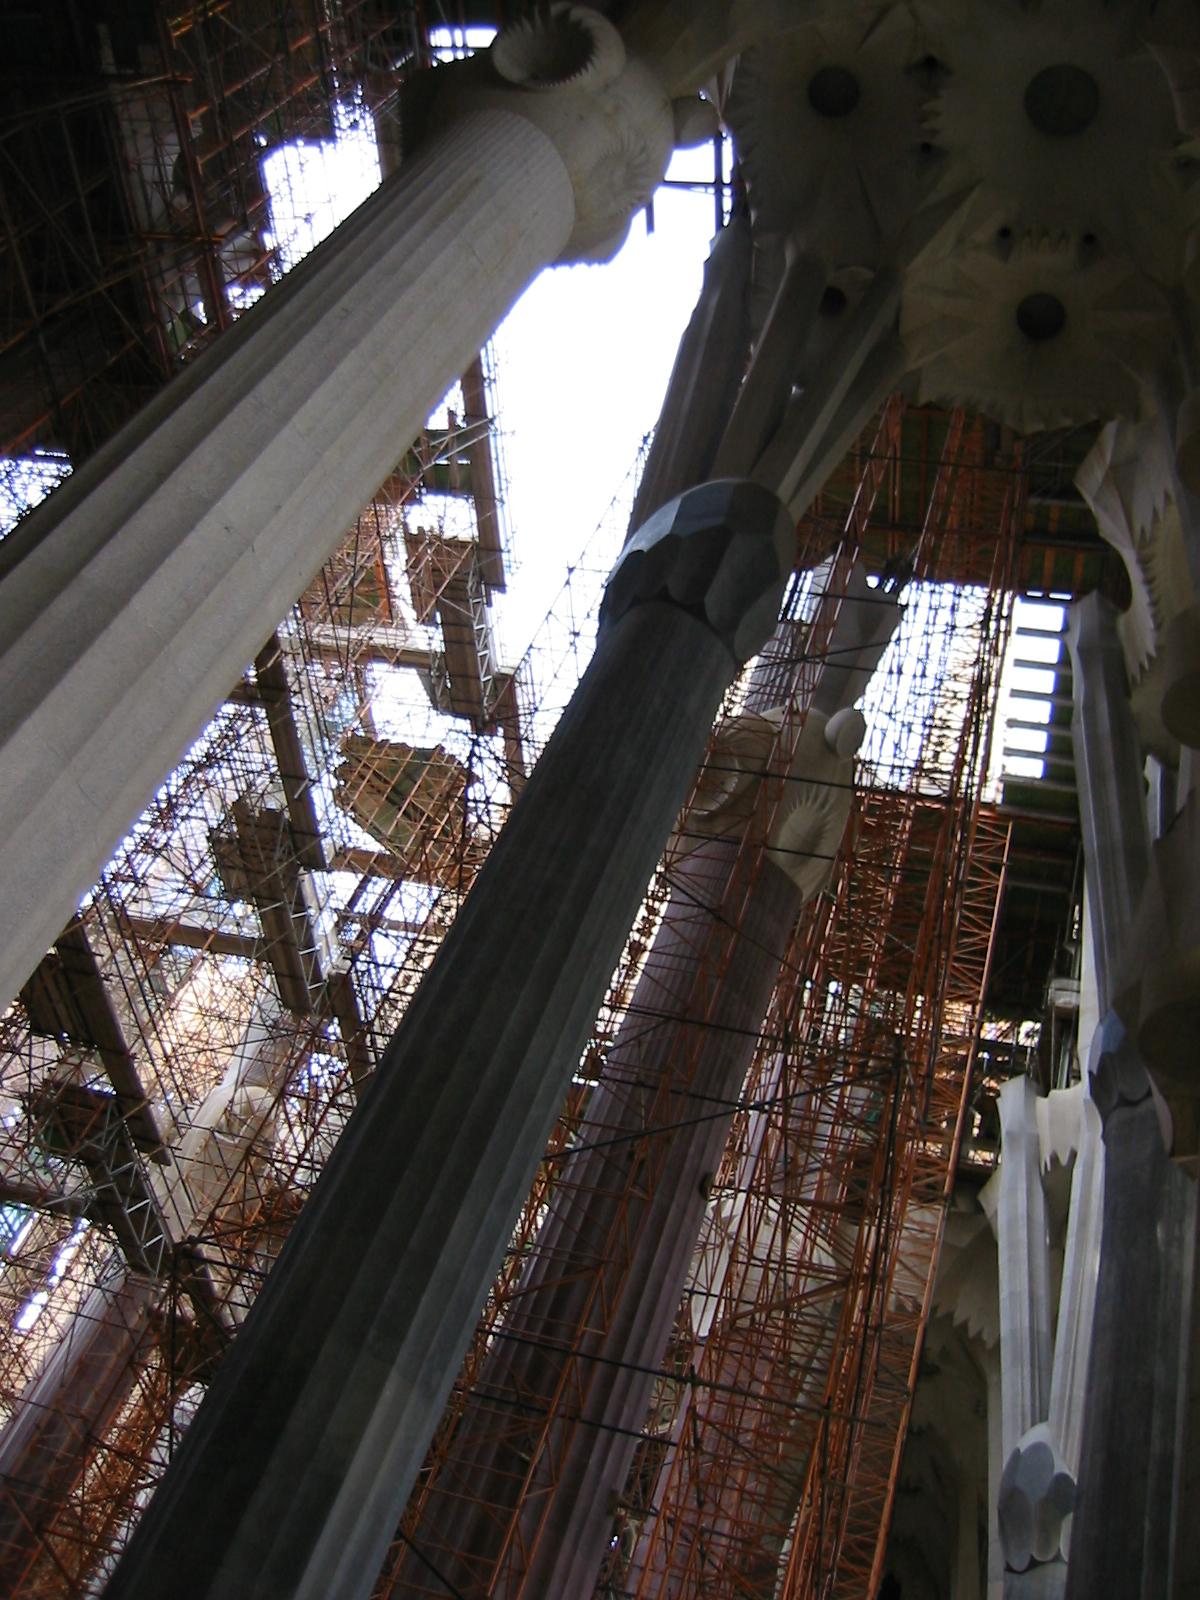 architecture interiors cathedral barcelona barca gaudi sagradafamilia sagrada familia column buildingsite construction constructionsite scaffold scaffolding